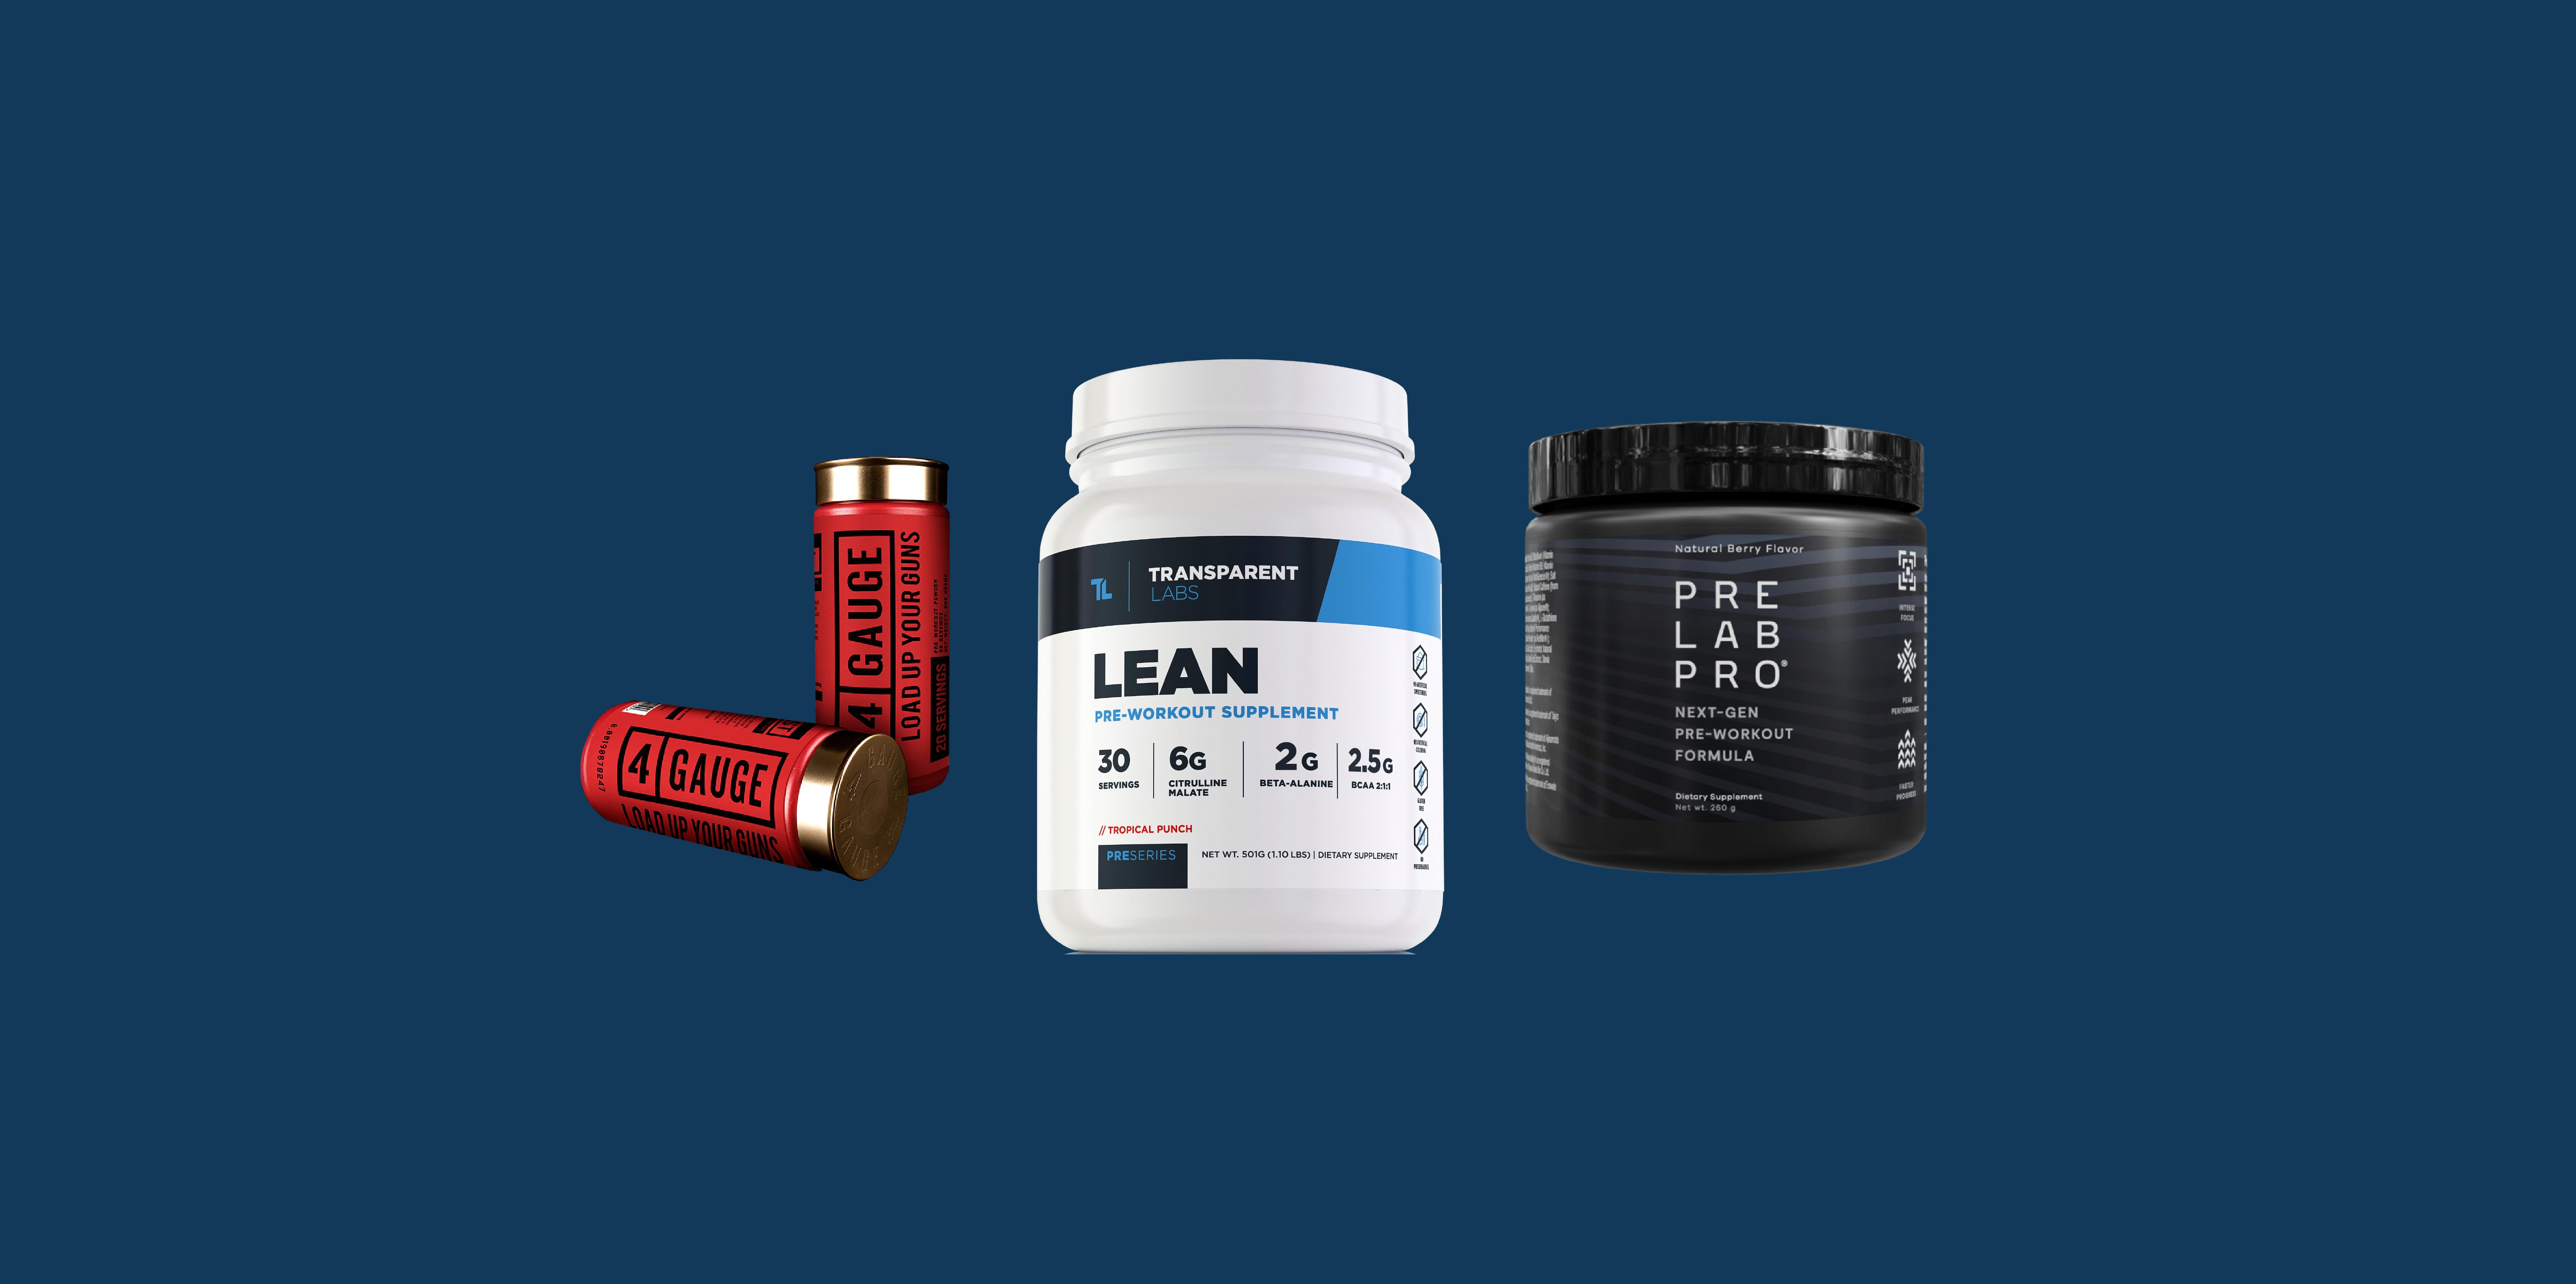 Best Tasting Pre-Workout Supplements